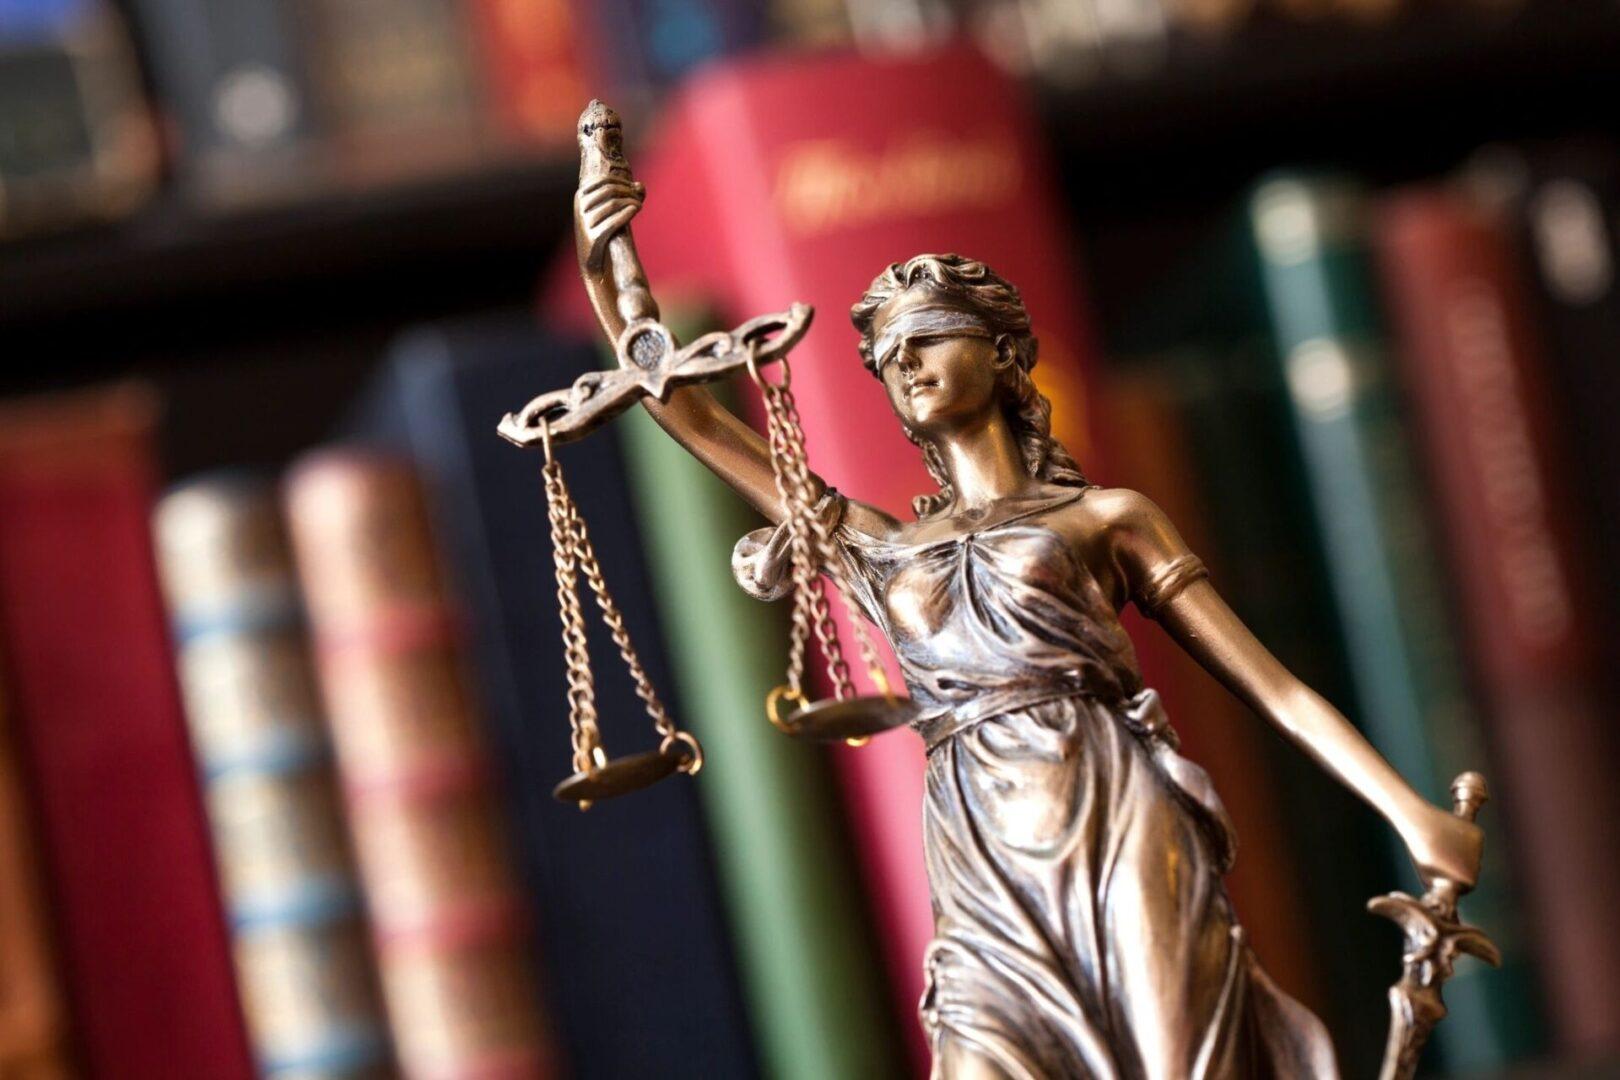 Schnitzer Law